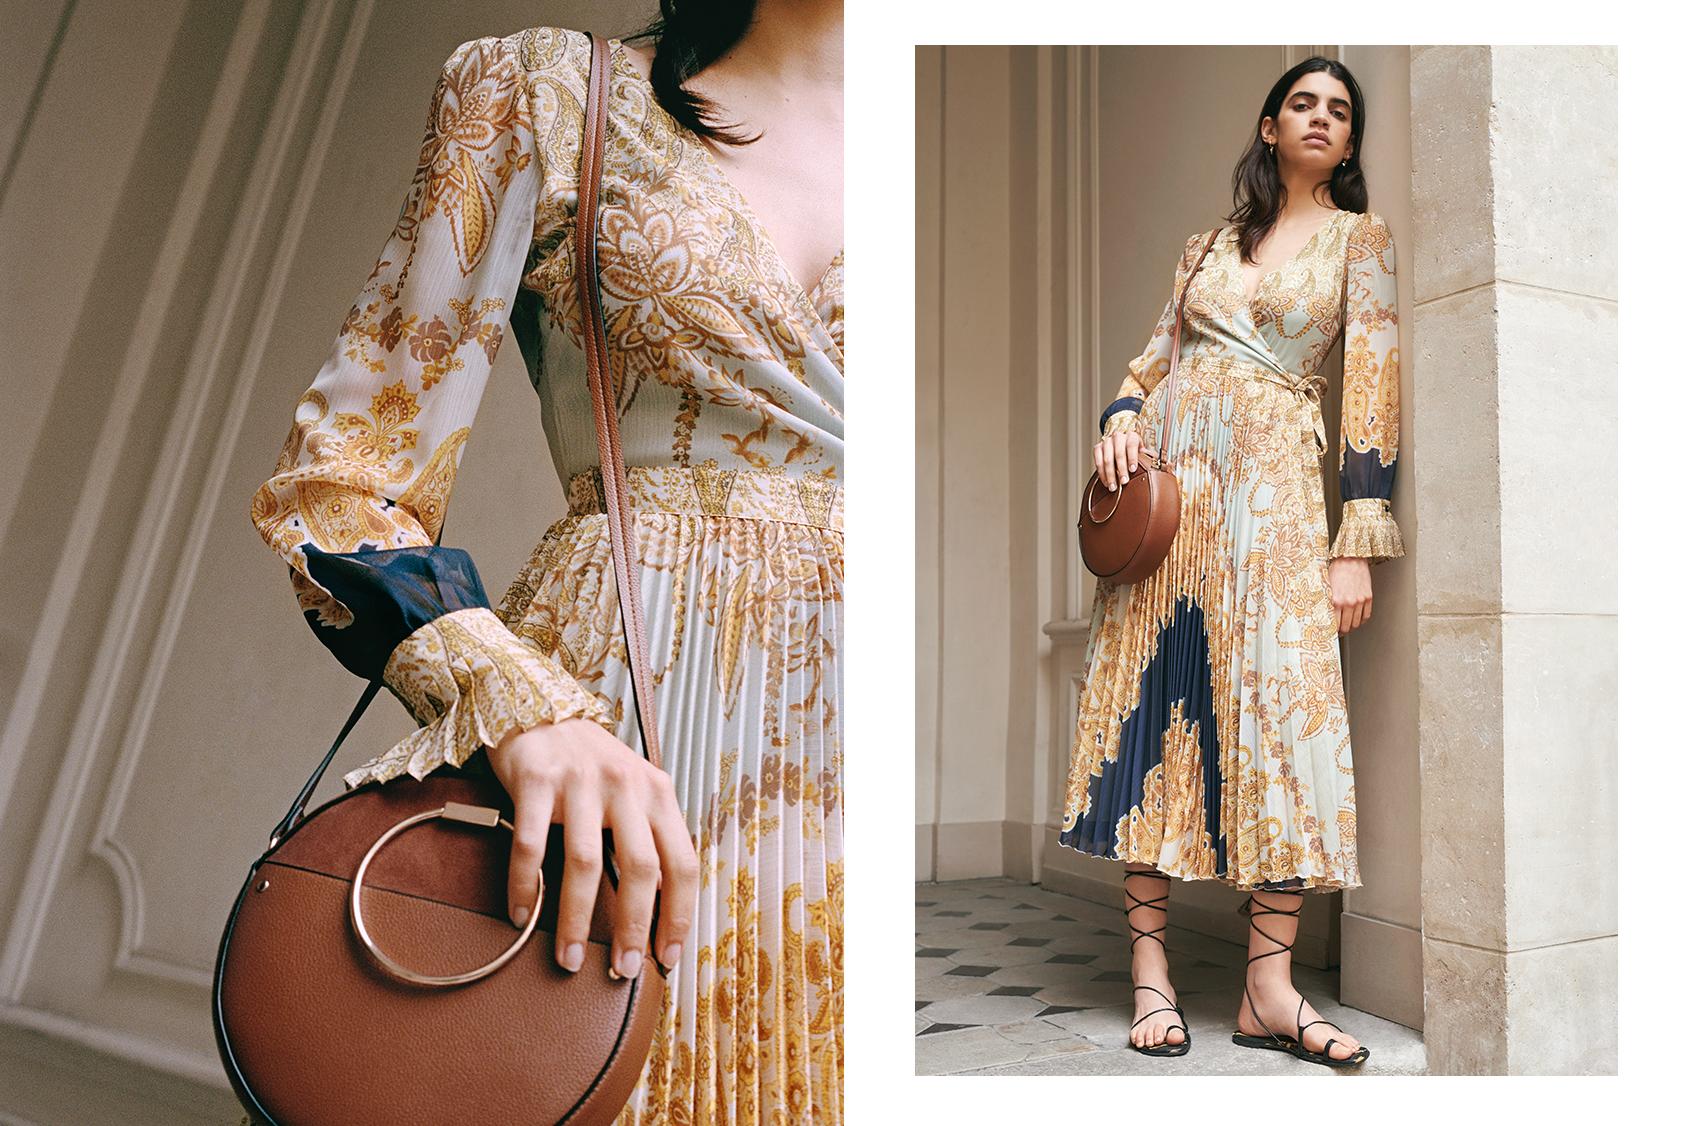 H&M bag and dress